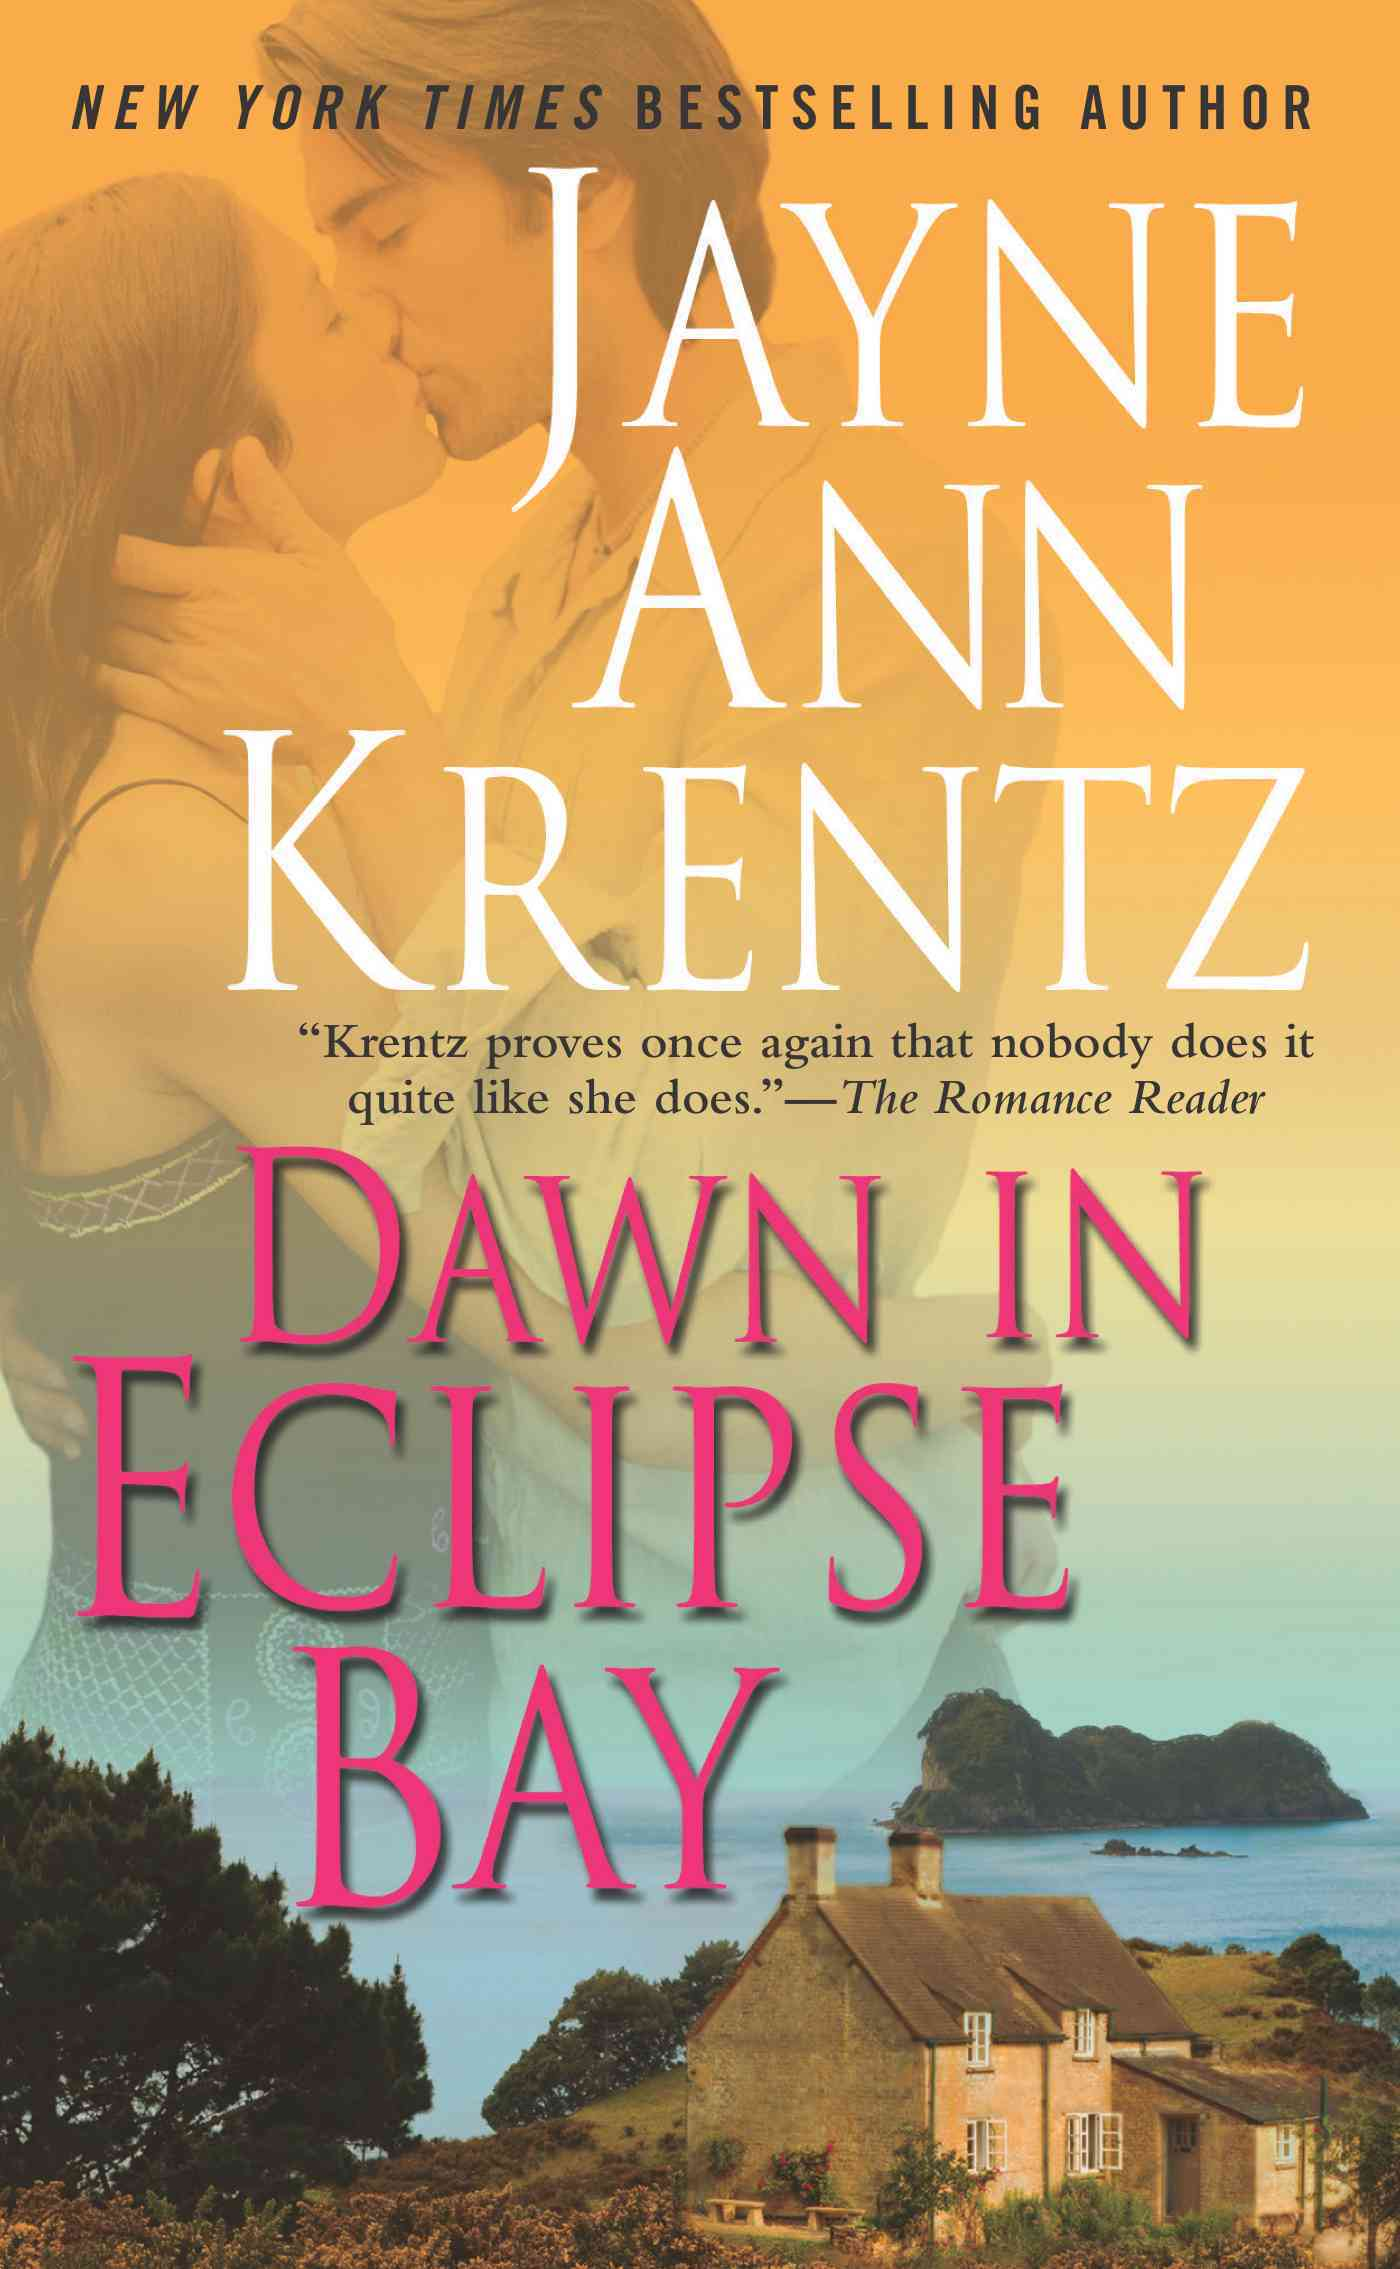 Dawn in Eclipse Bay (Paperback)